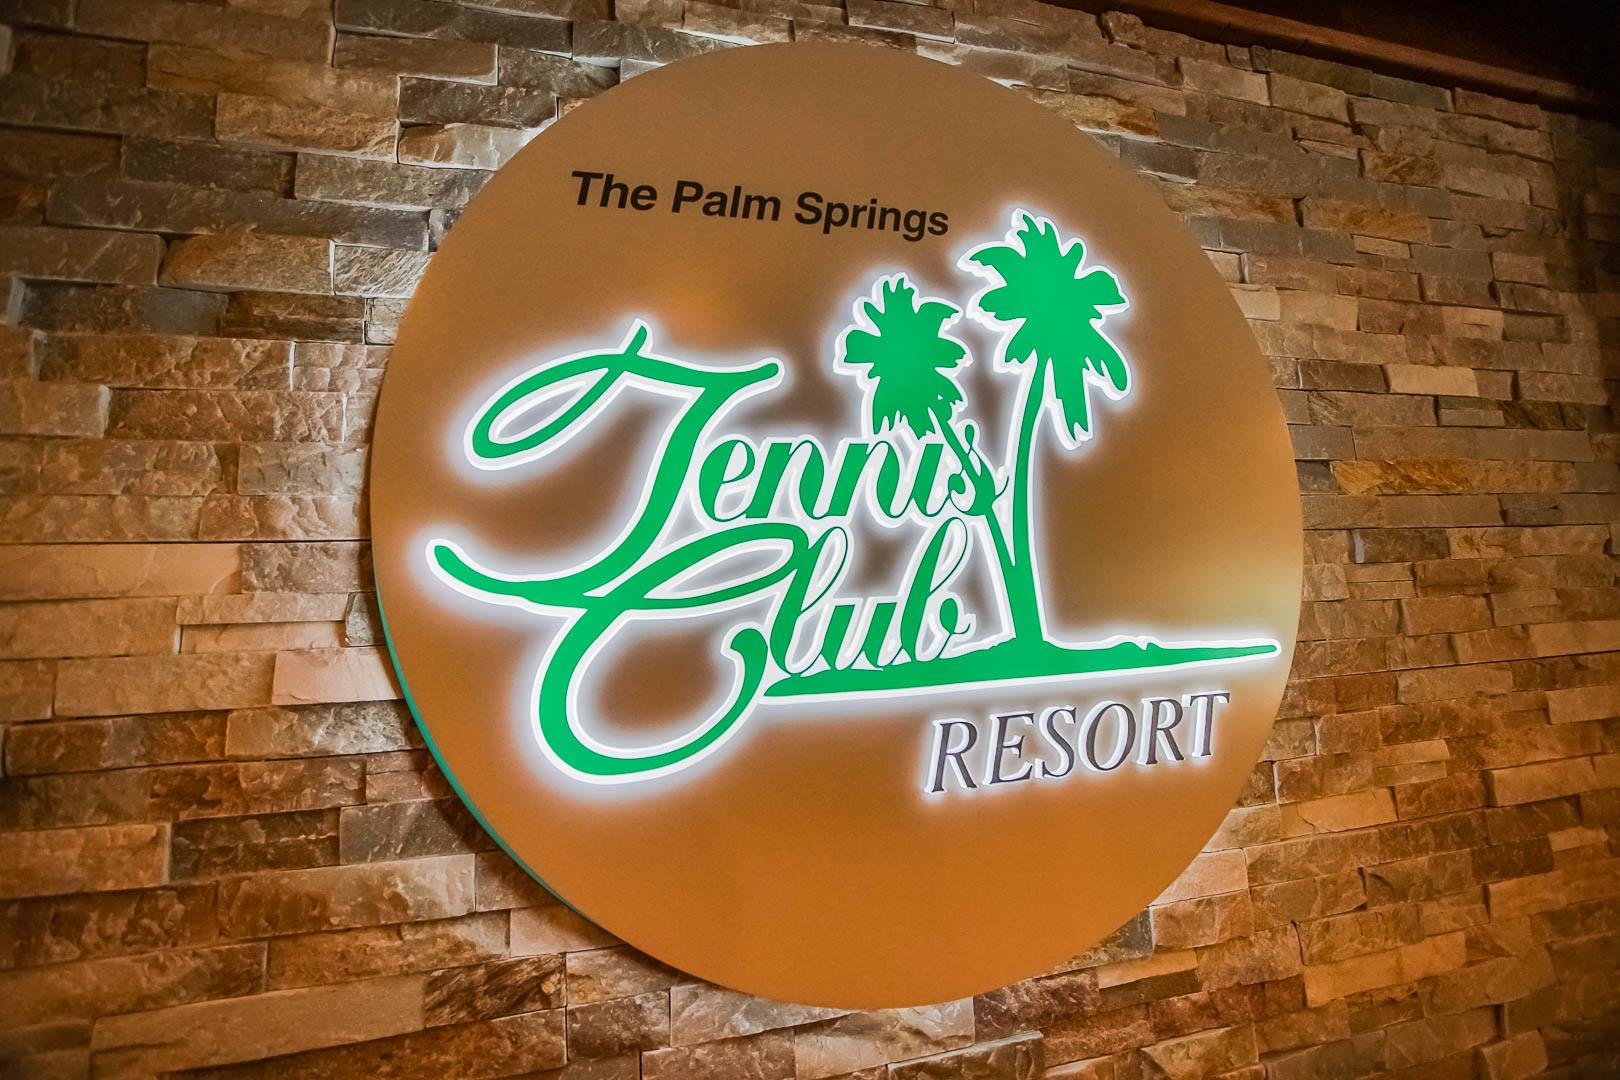 A modern resort signage at VRI's Palm Springs Tennis Club in California.